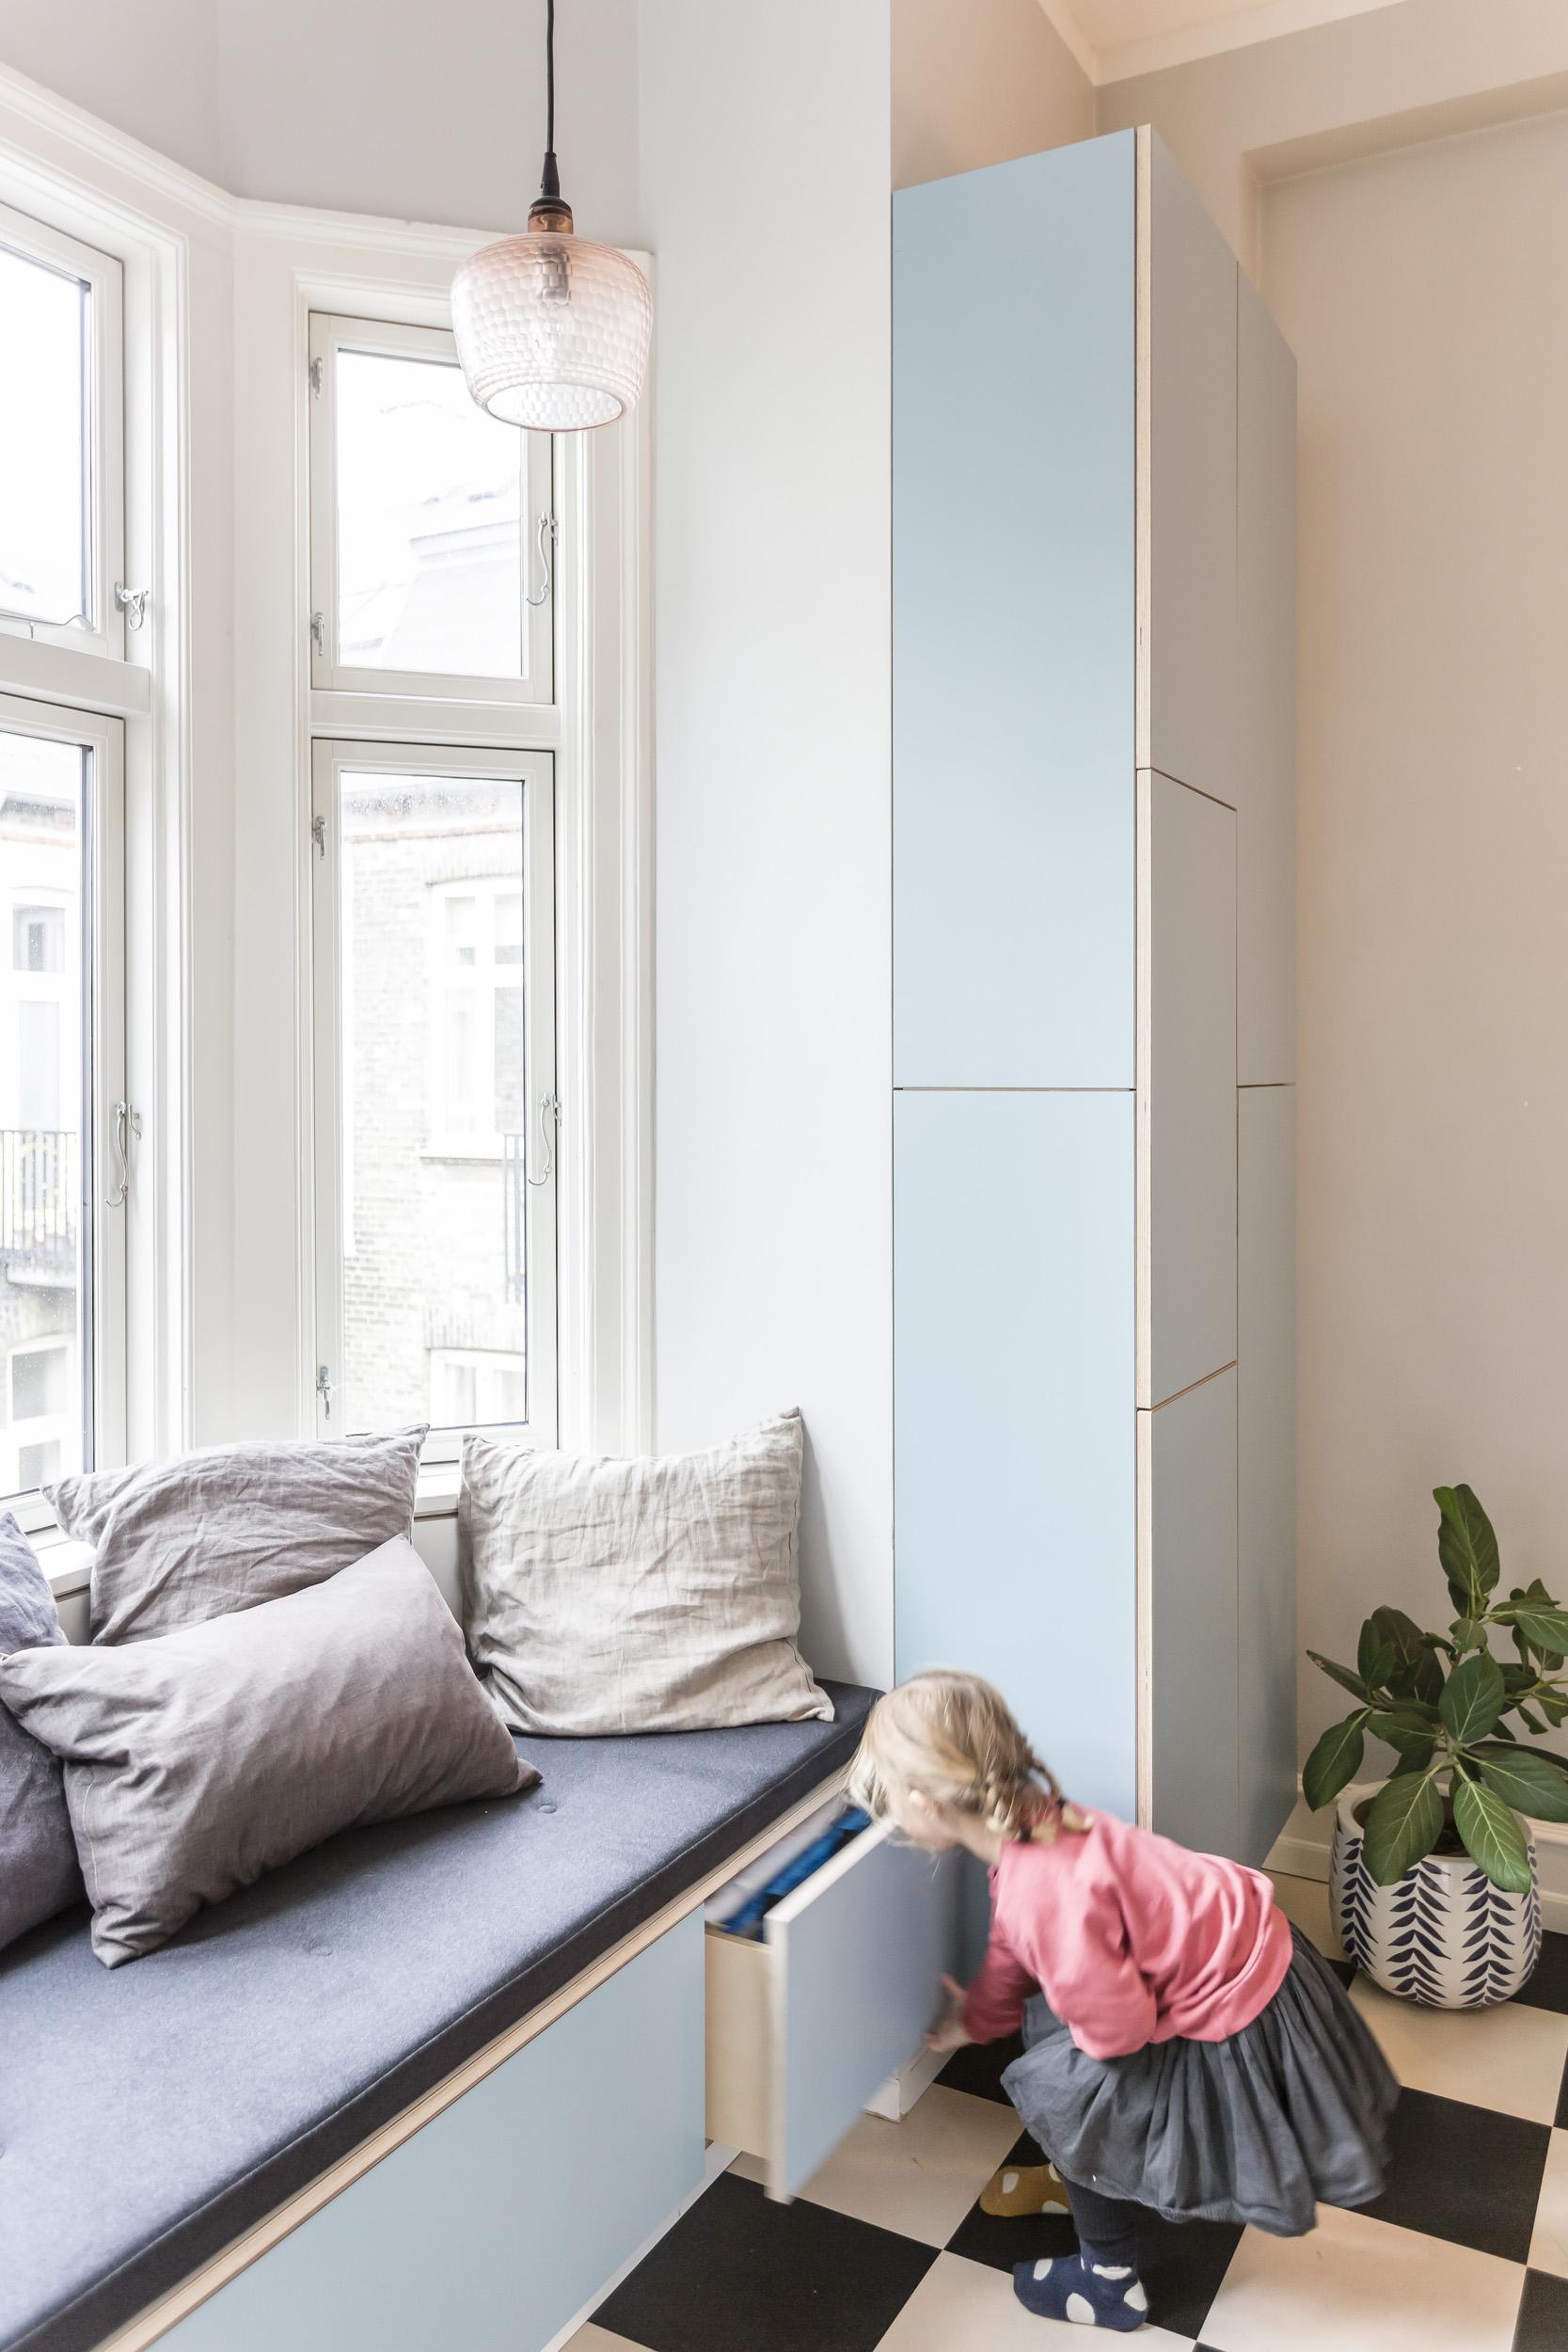 0376-a3v1-kitchen-storage-bench-seating-bay window-blue-minimal-stay-project-2500x.jpg